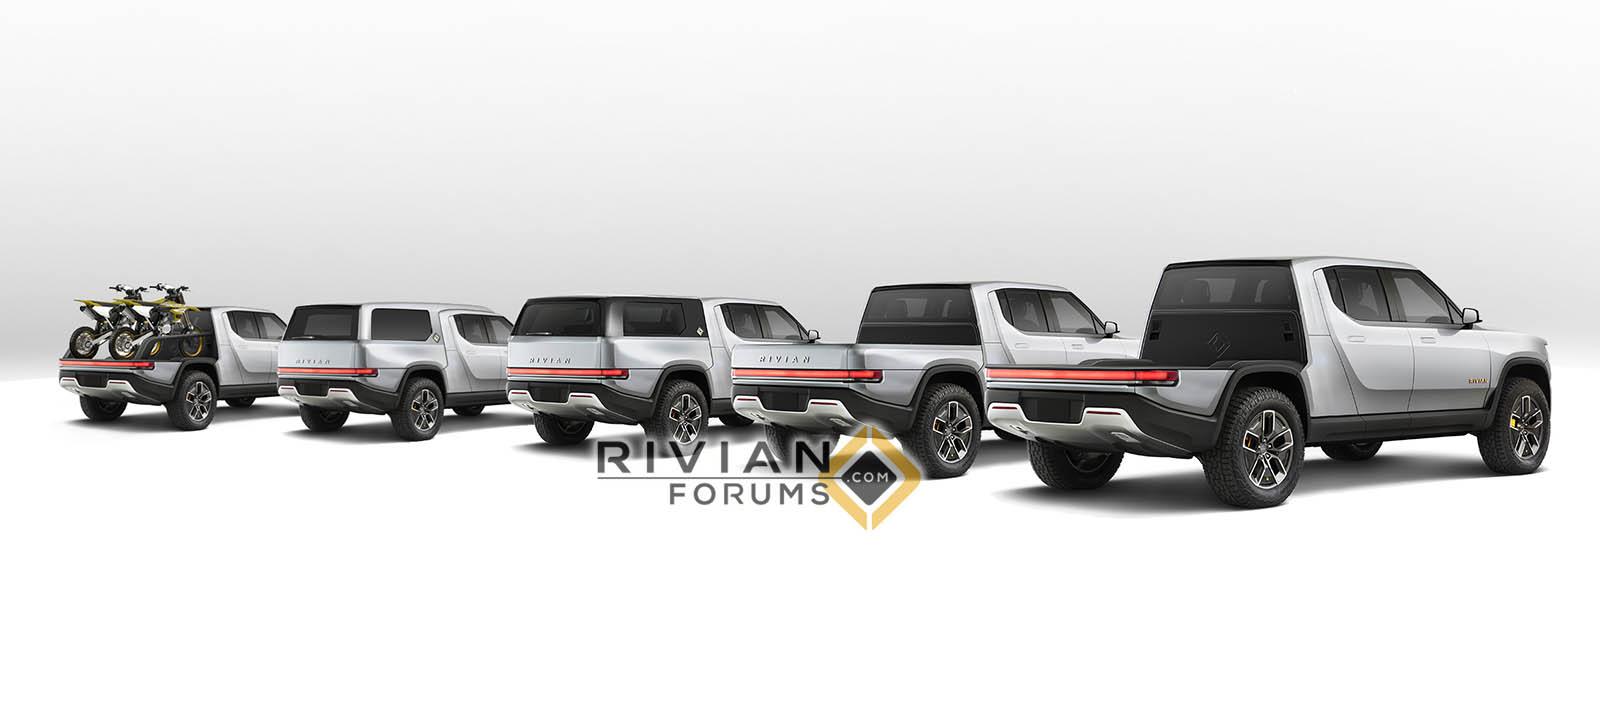 Rivian-Modules-7-Rivianforums_COVER